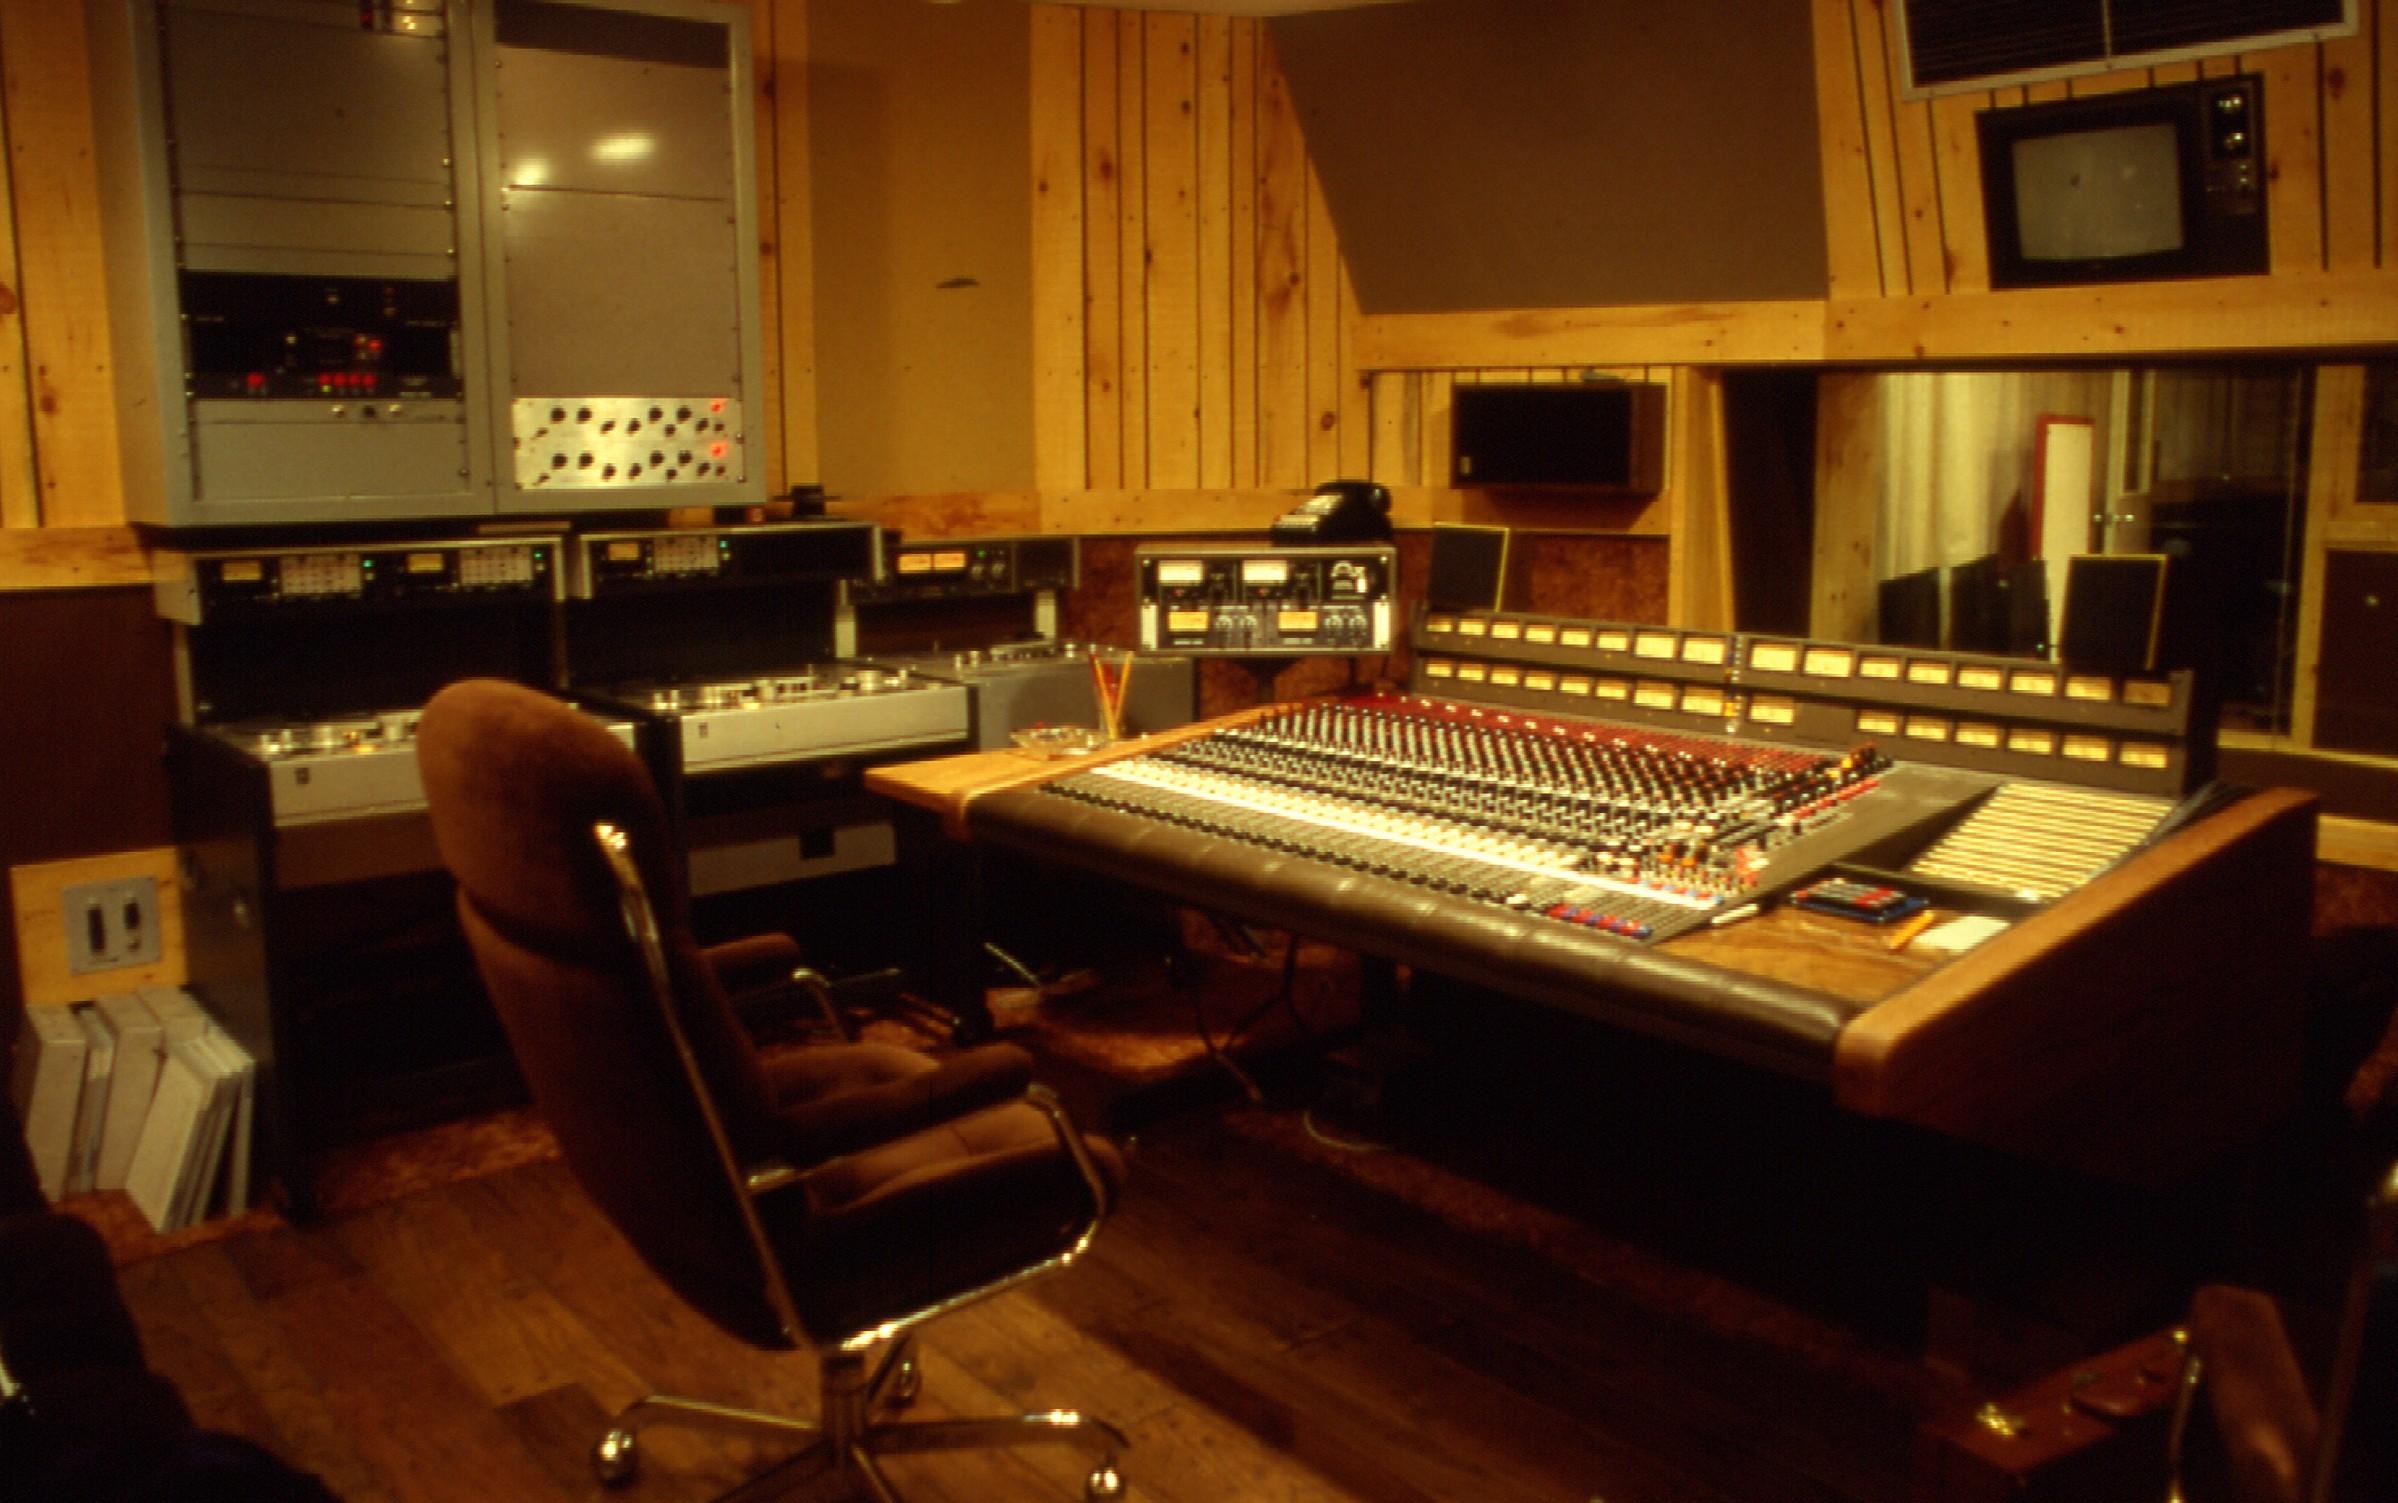 File:Manta Sound Studi...